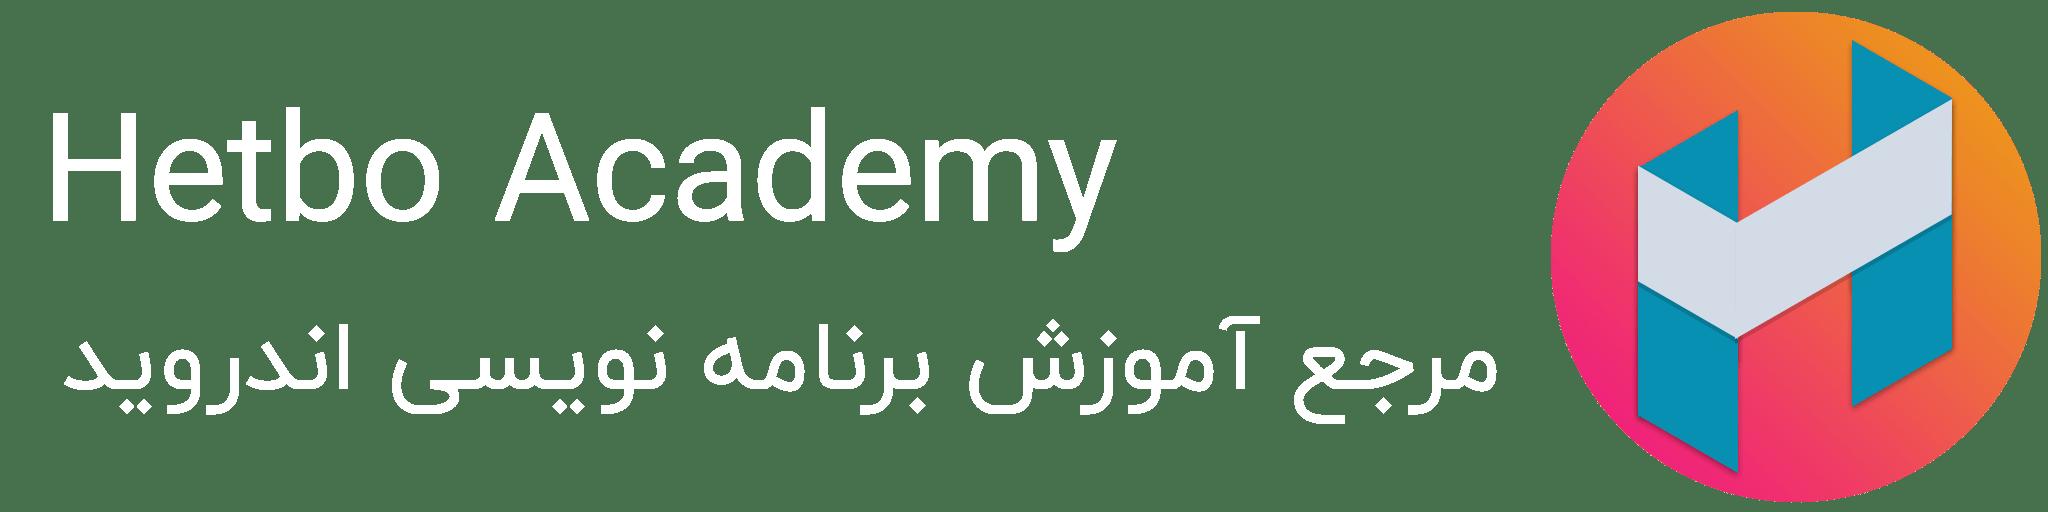 Hetbo Academy